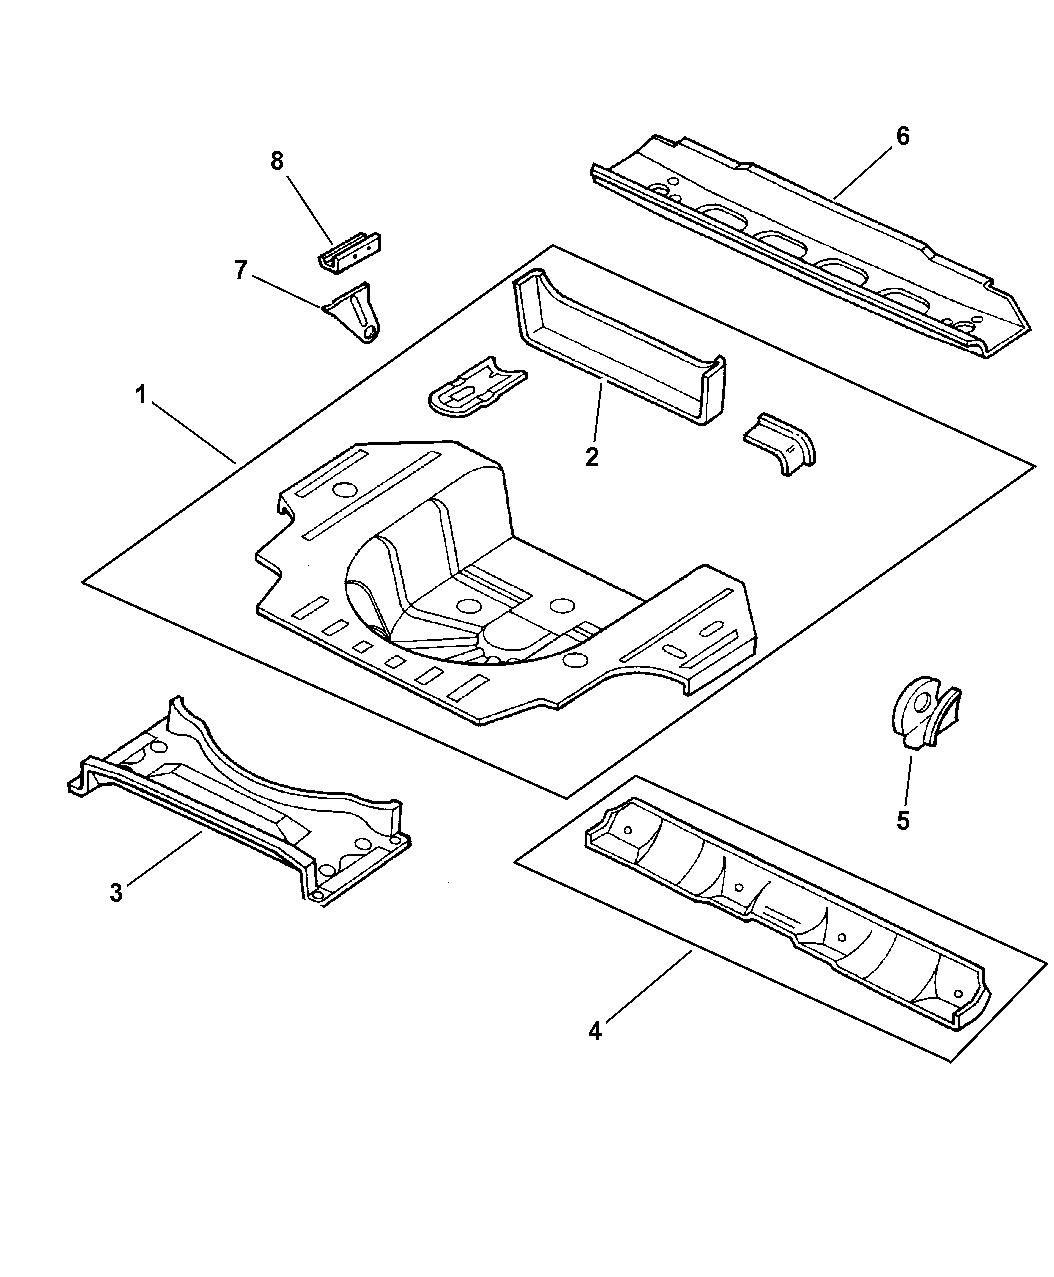 1999 Dodge Intrepid Rear Floor Pan